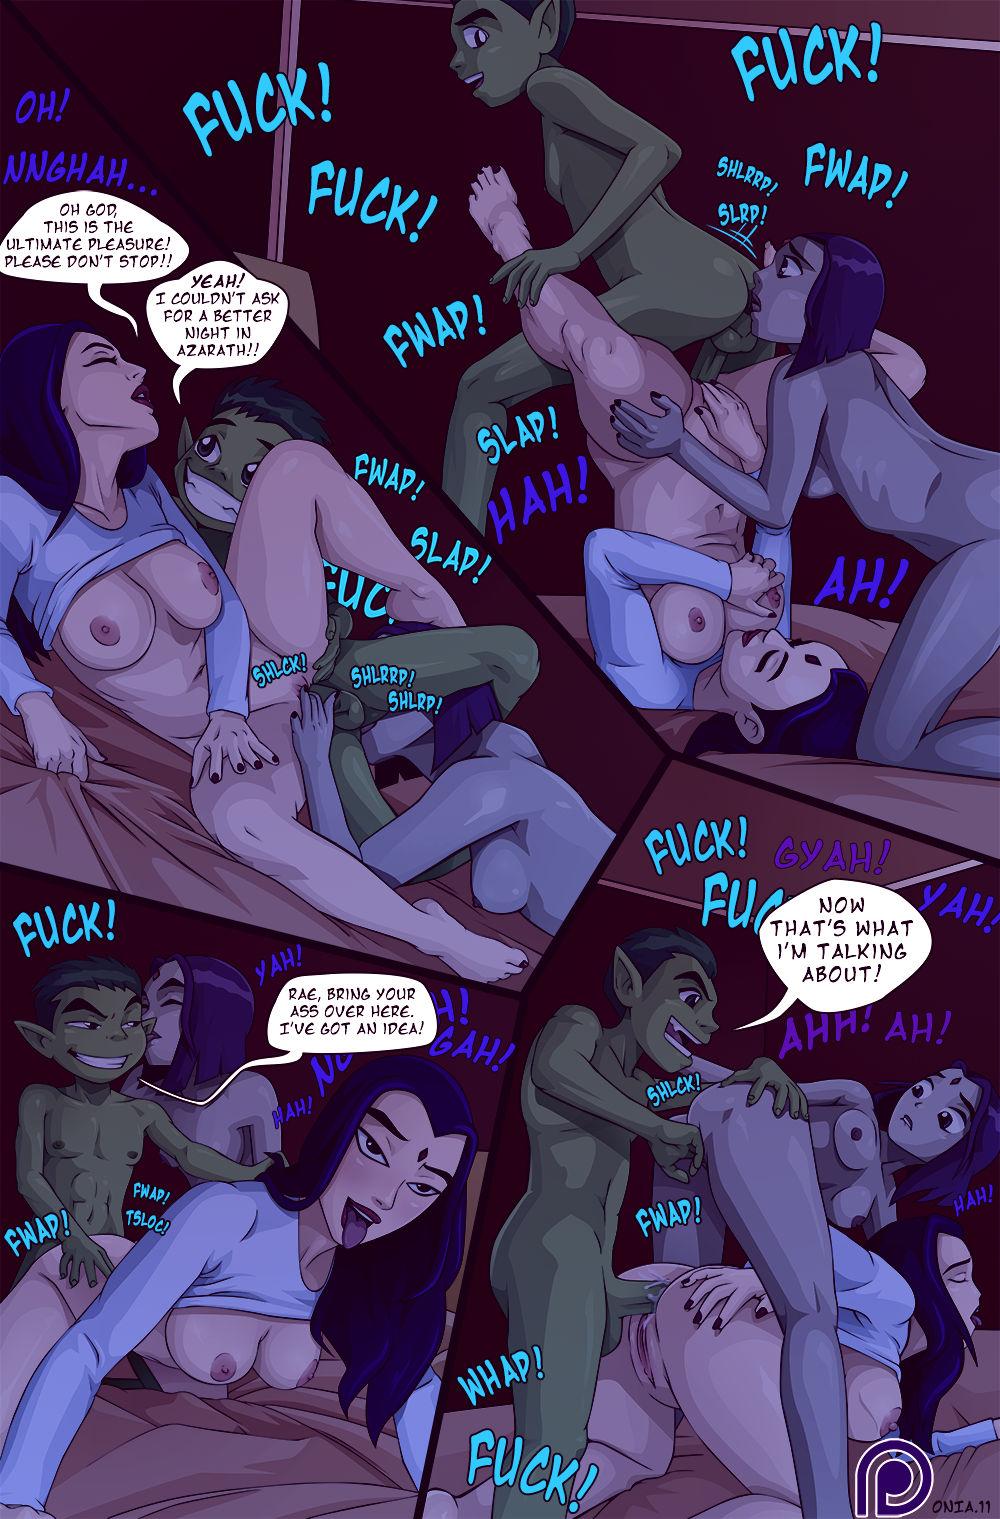 One night in azarath porn comic picture 11